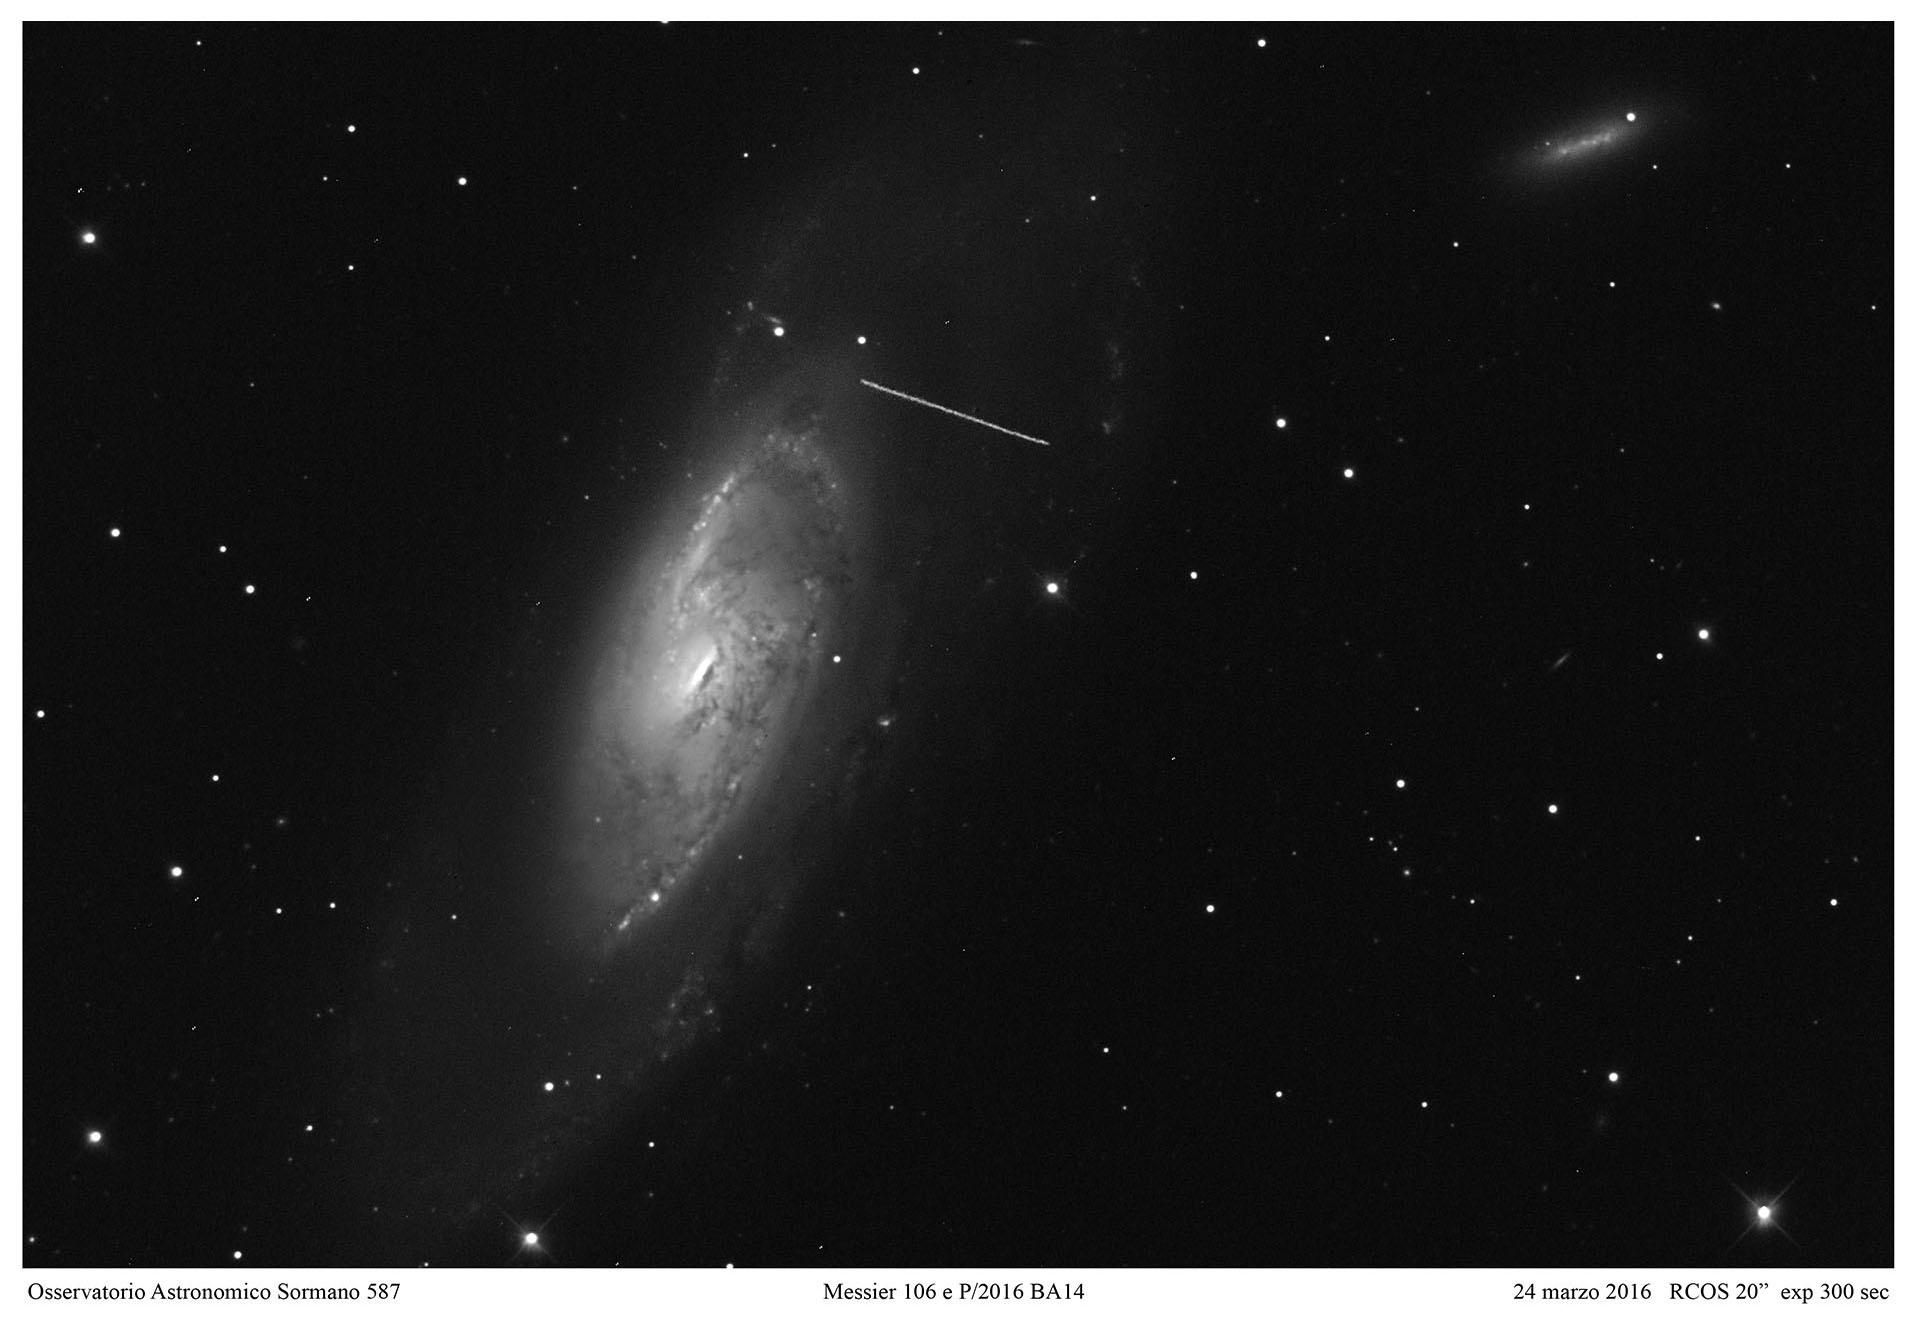 Cometa P2016 BA14